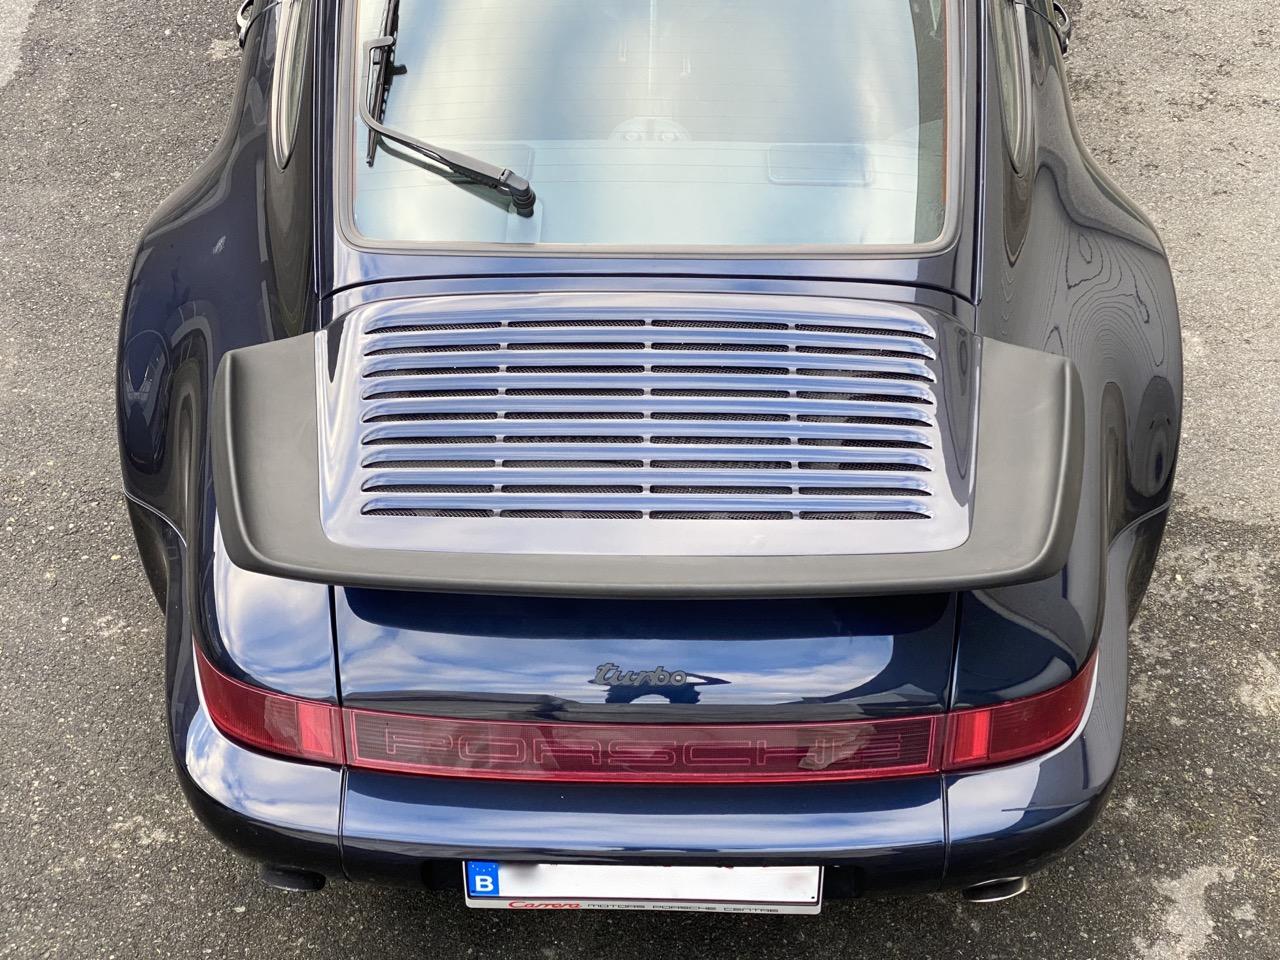 youngtimer.one - Porsche 964 turbo - Nachtblau - 1991 - 3 of 3